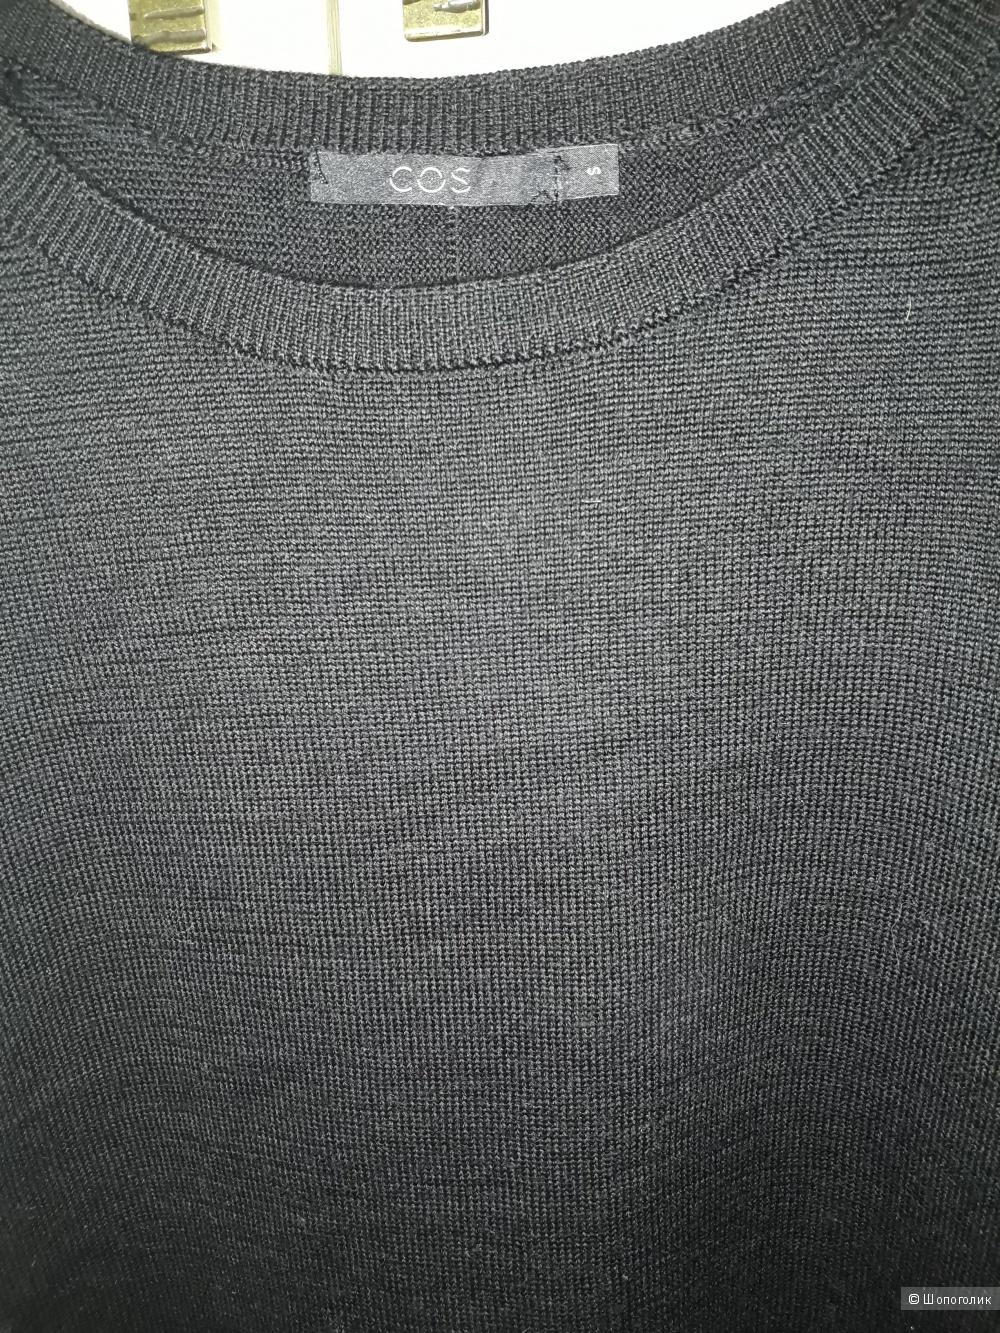 Платье-свитер cos, размер s